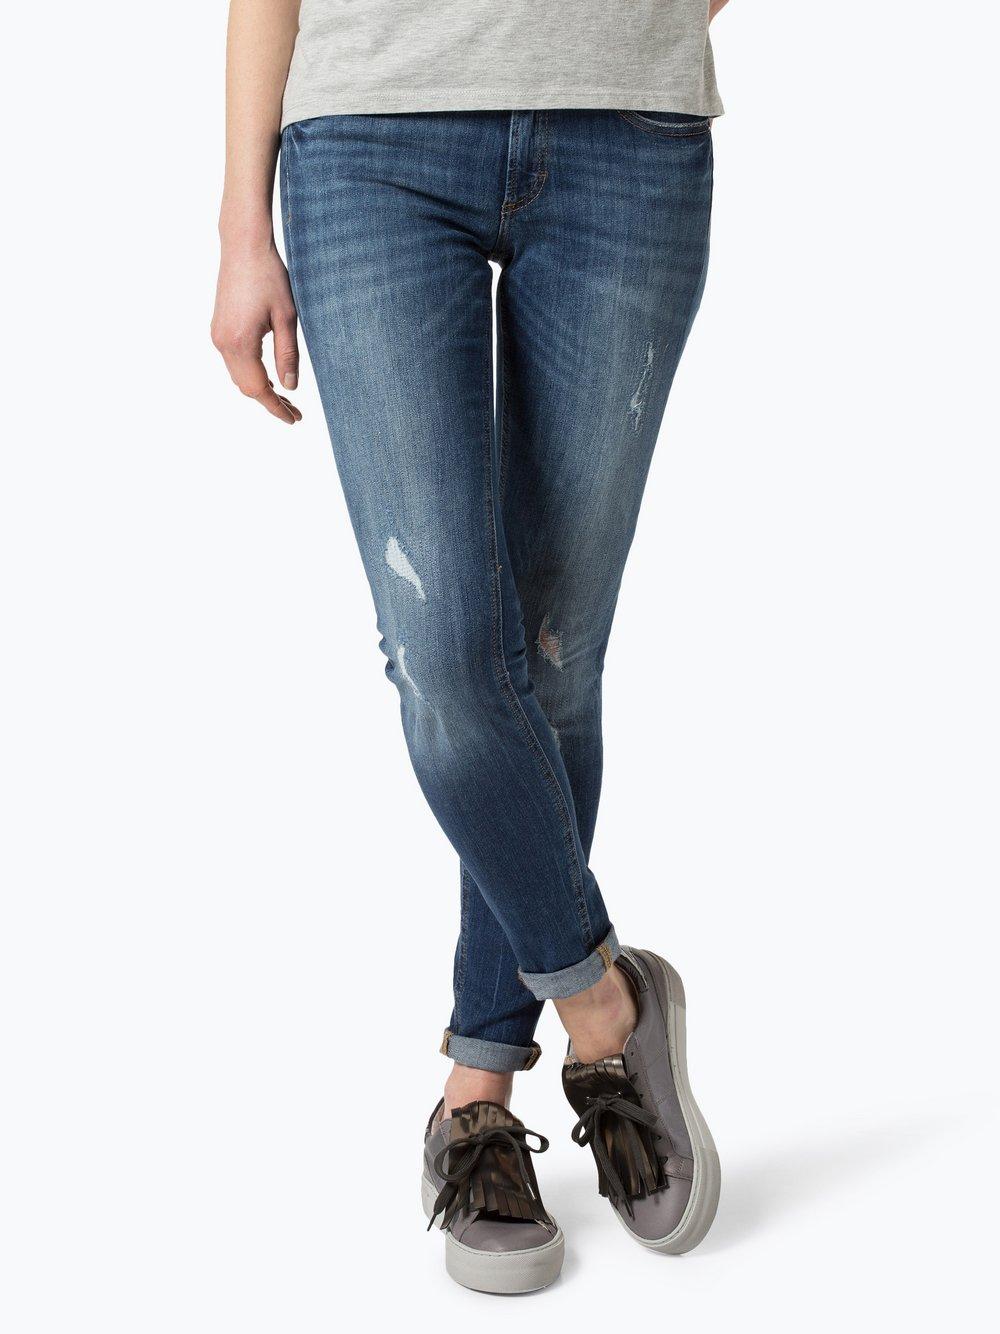 Marc O'Polo Damen Jeans Lulea online kaufen | VANGRAAF.COM